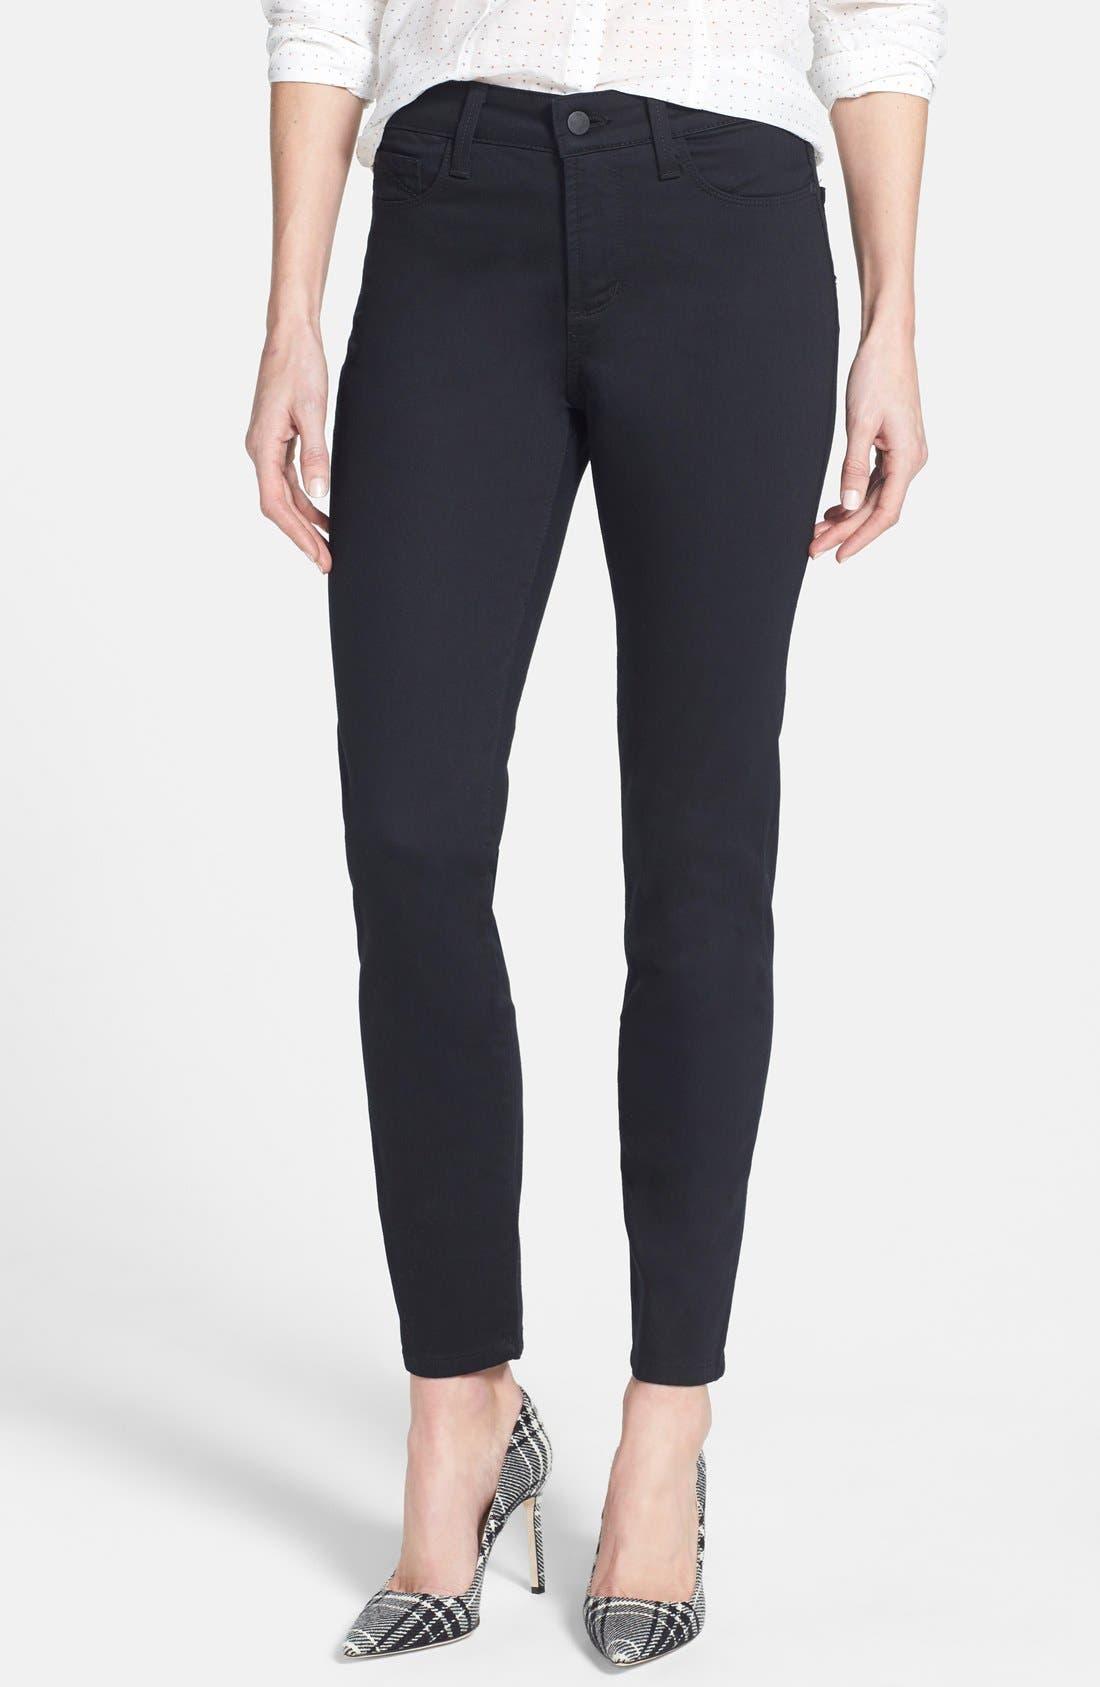 NYDJ Clarissa Colored Stretch Ankle Skinny Jeans (Regular & Petite)